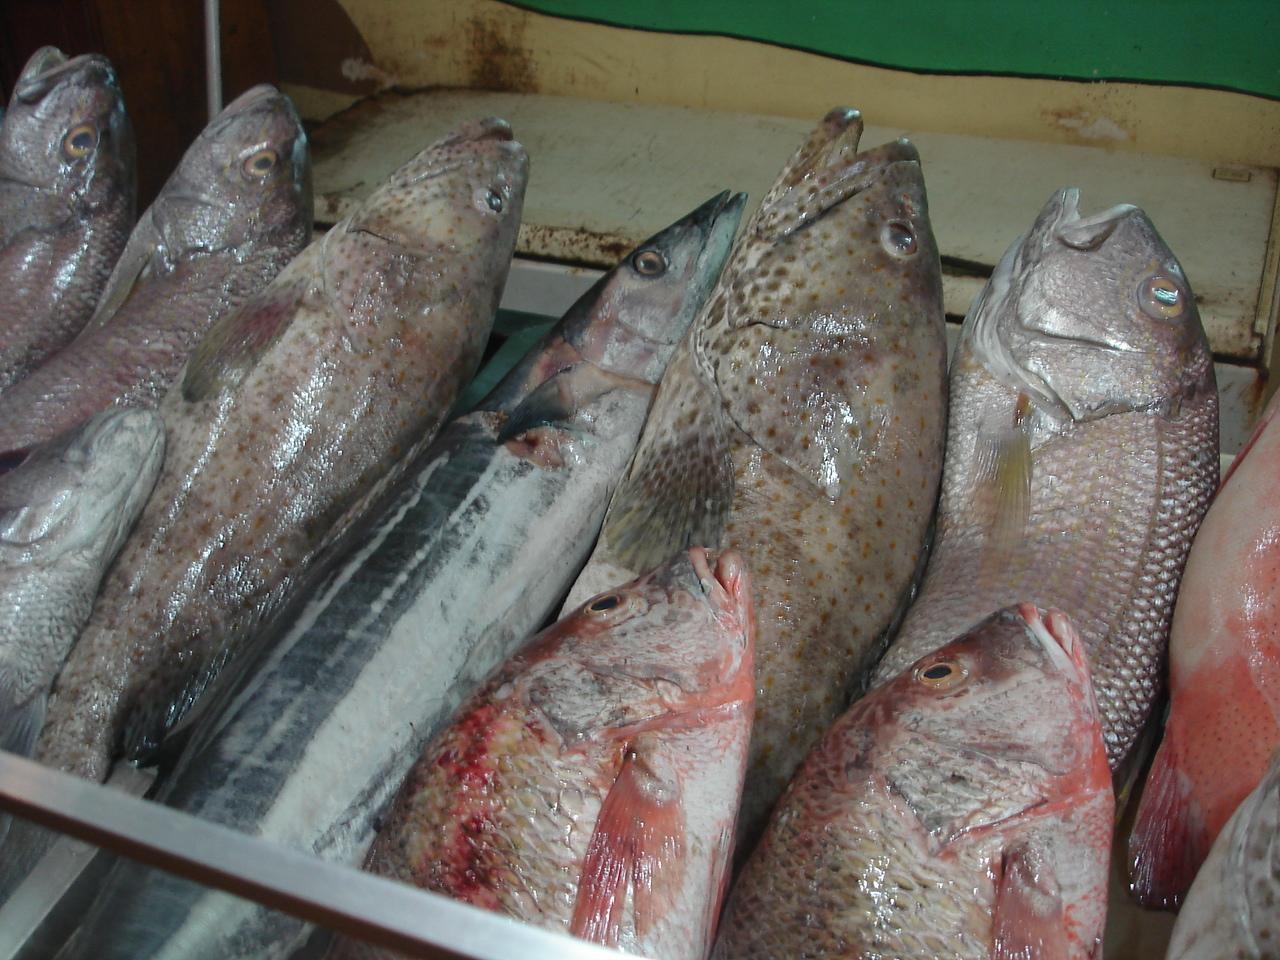 Yet more fish...